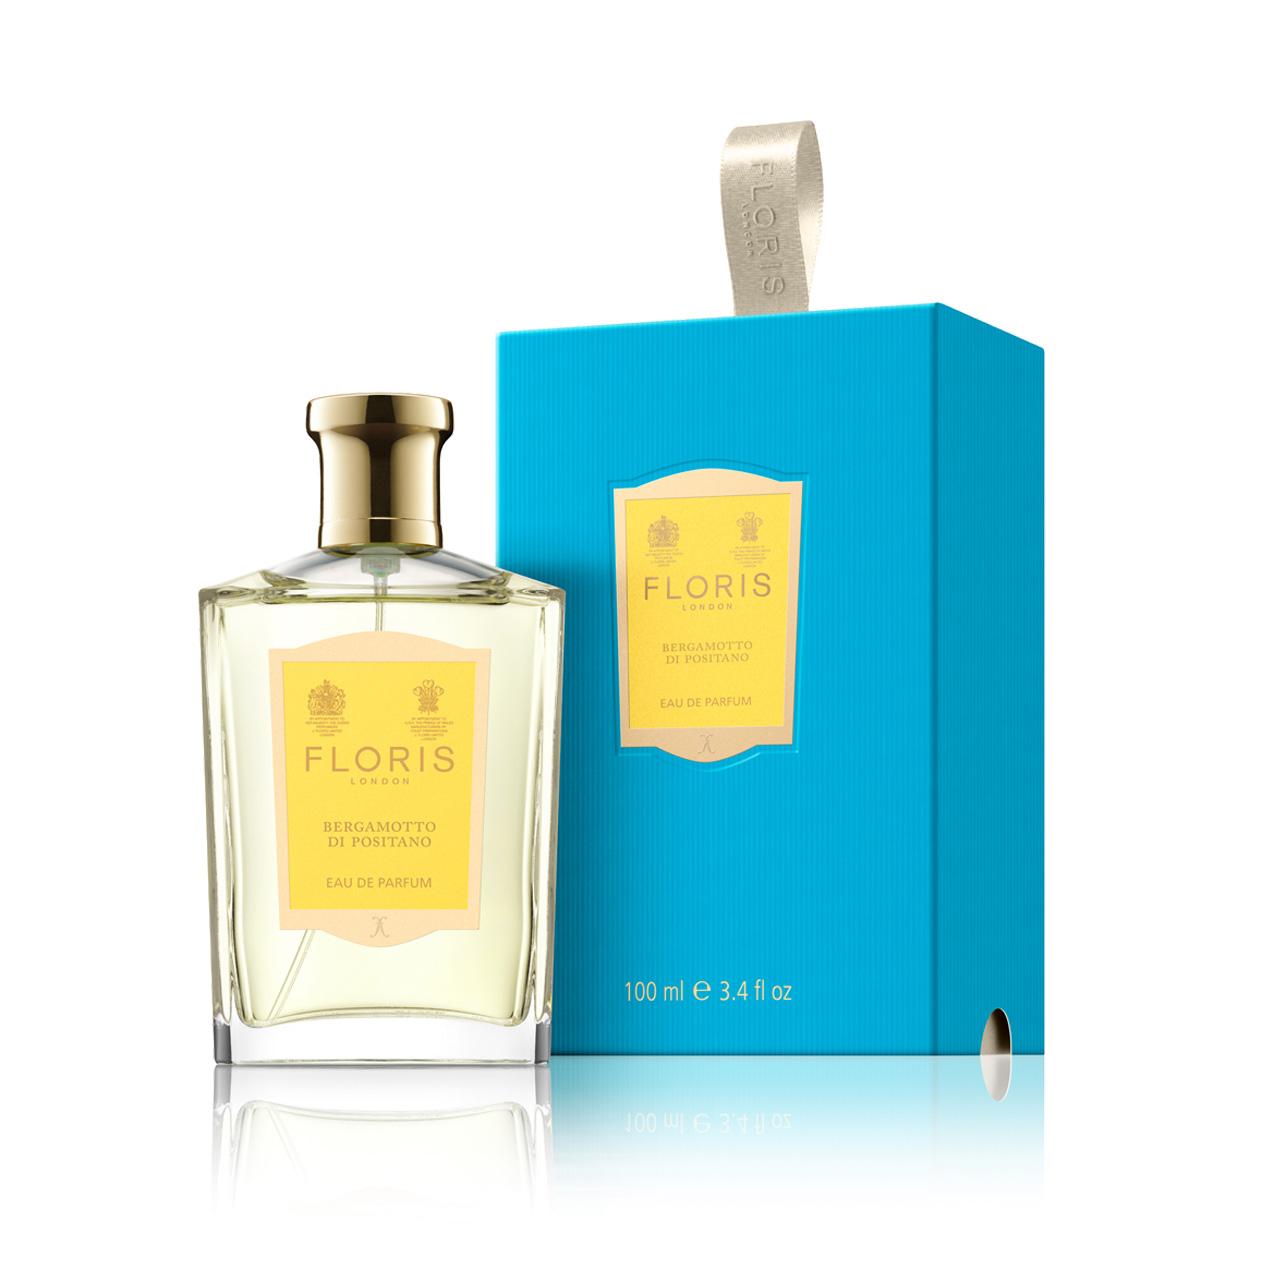 Bergamotto di Positano - Eau de Parfum - Private Collection